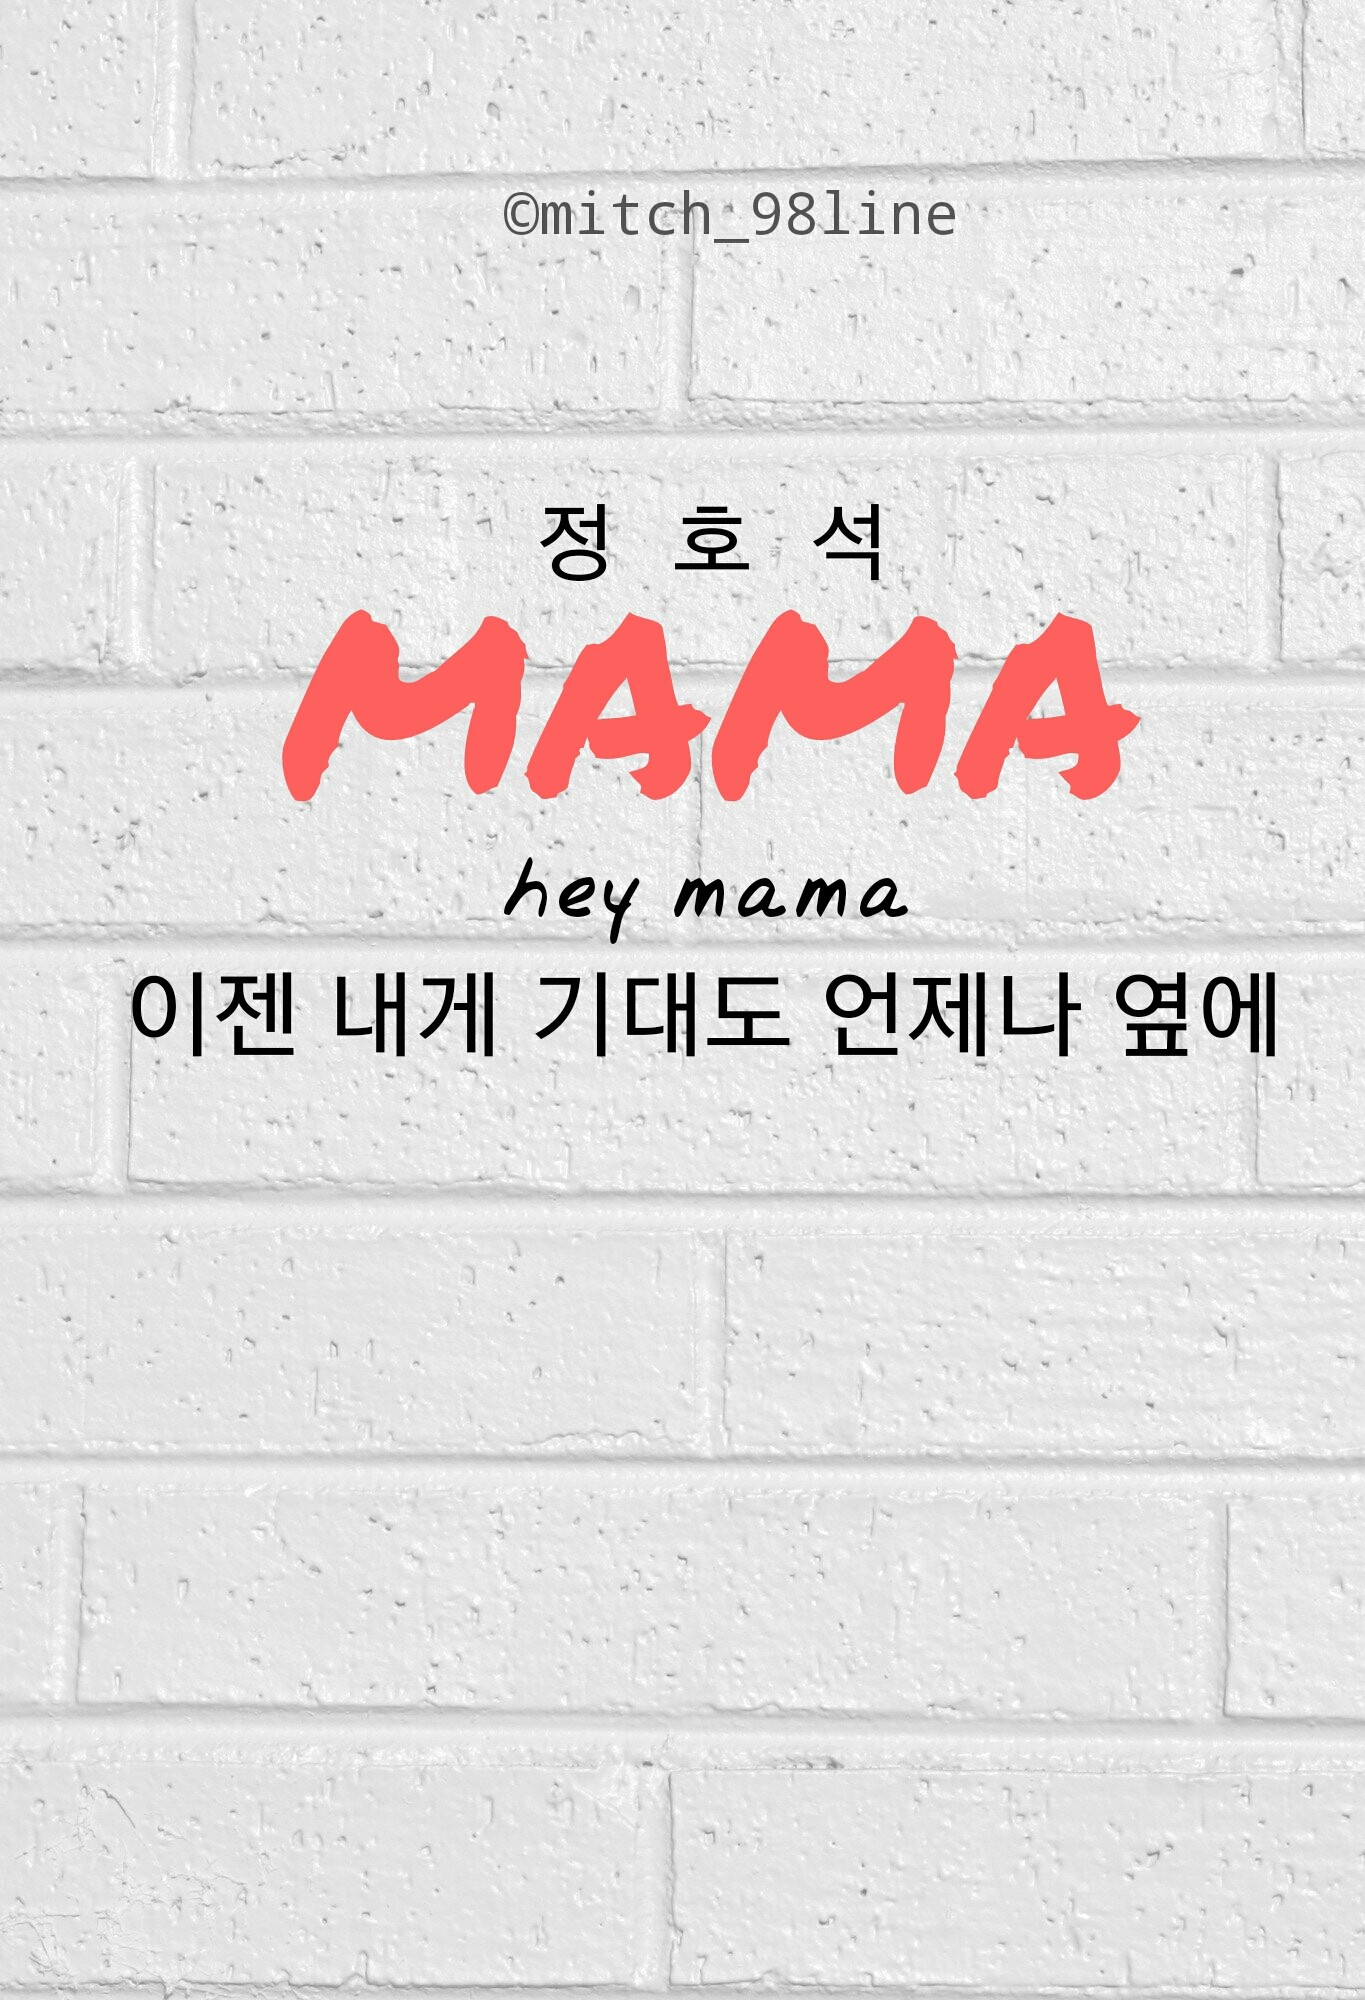 BTS / J-Hope / Lyrics / Wallpaper ©mysunrisehoseok